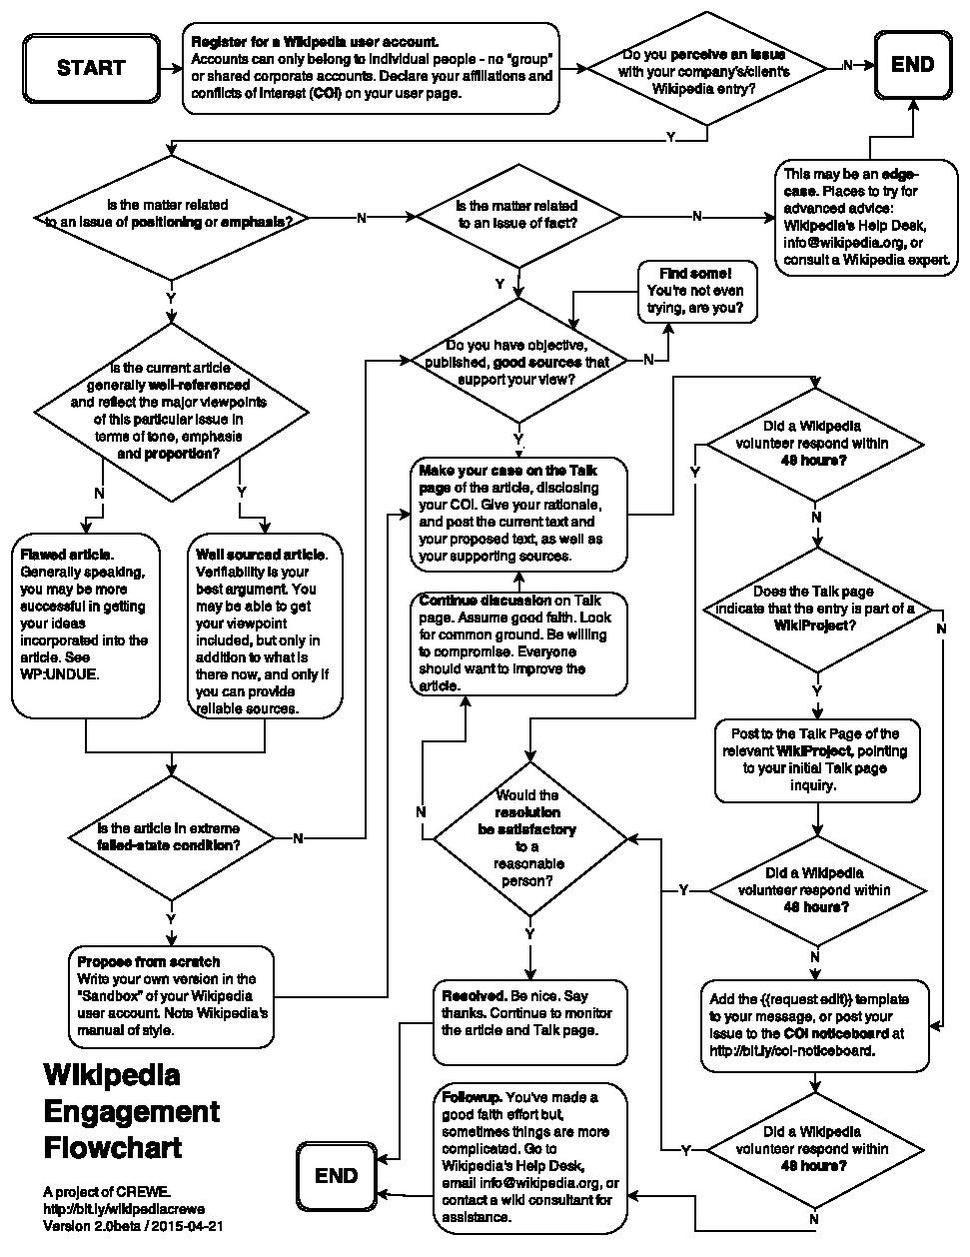 filecrewe wikipedia engagement flowchartpdf wikipedia